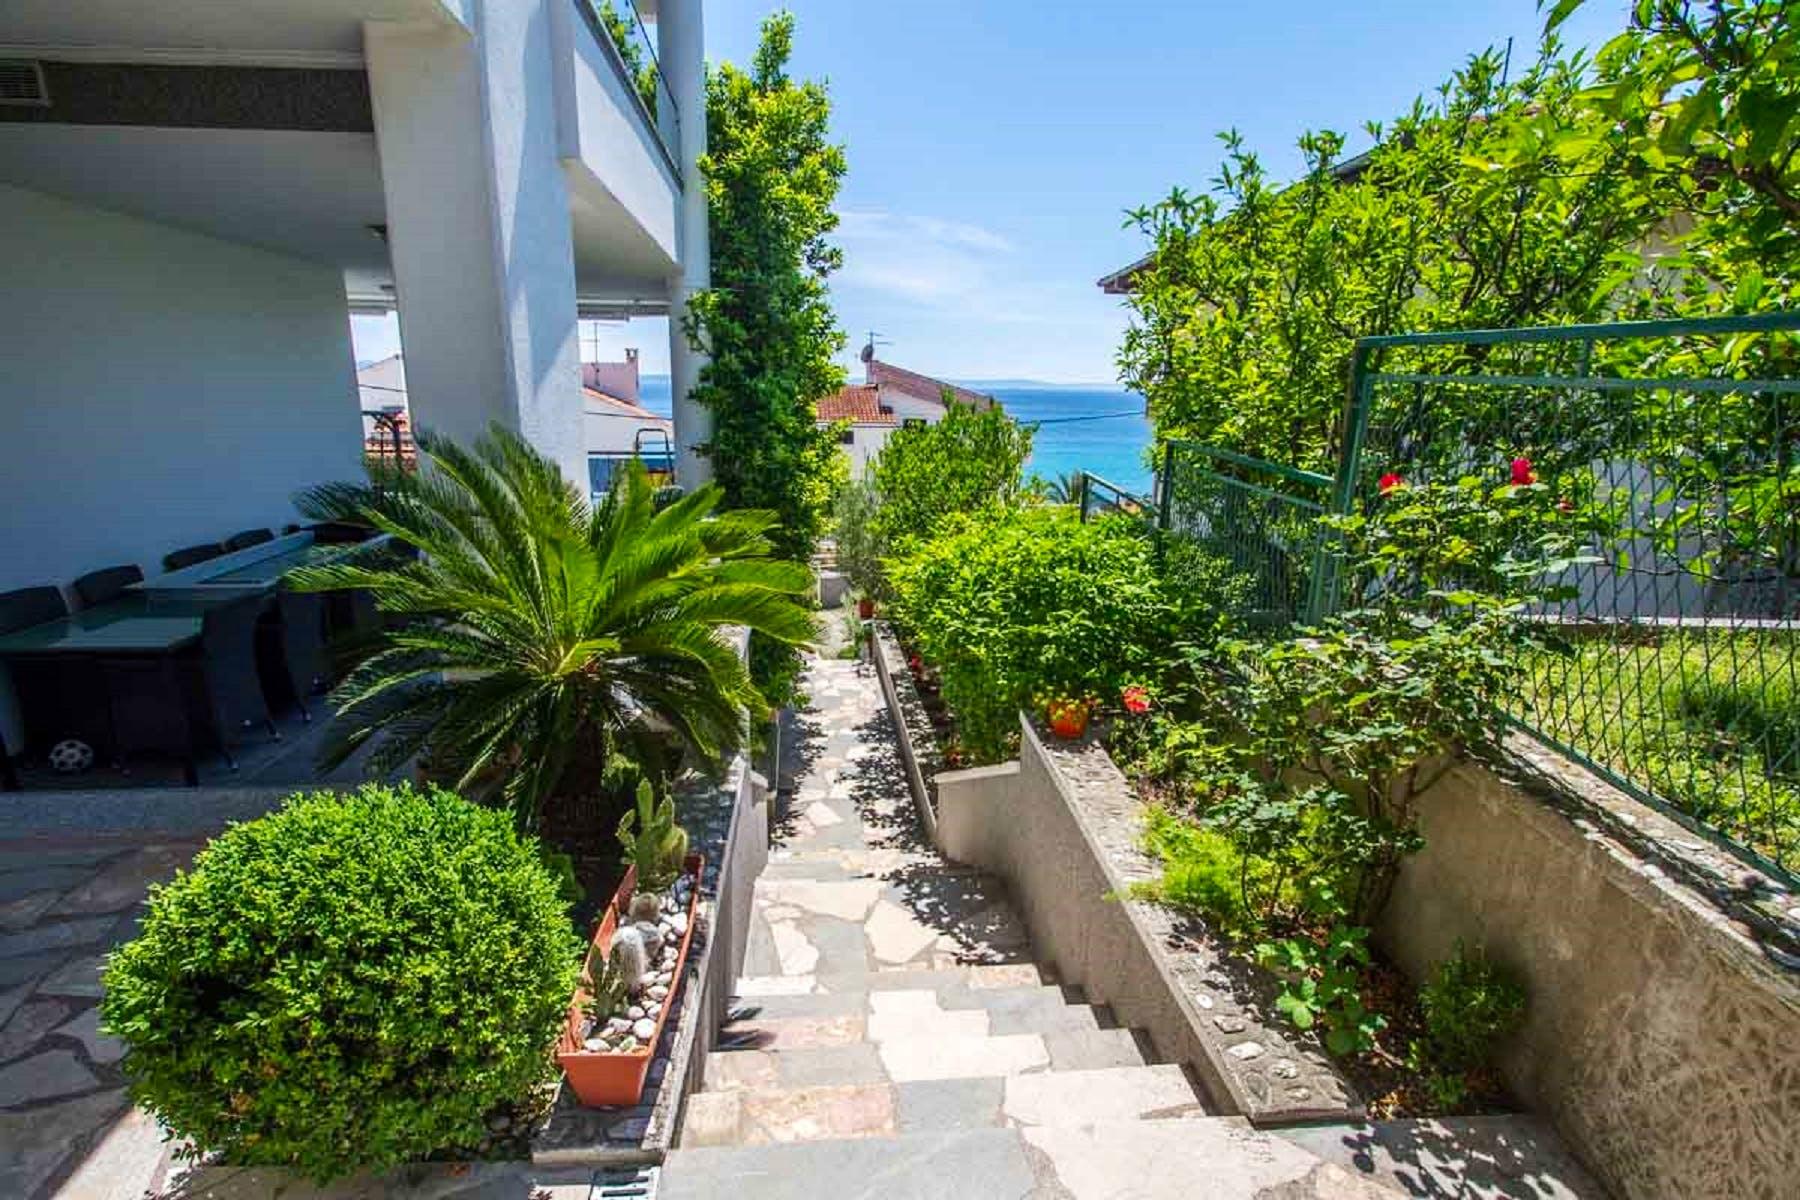 Outdoor area boasting Mediterranean flora